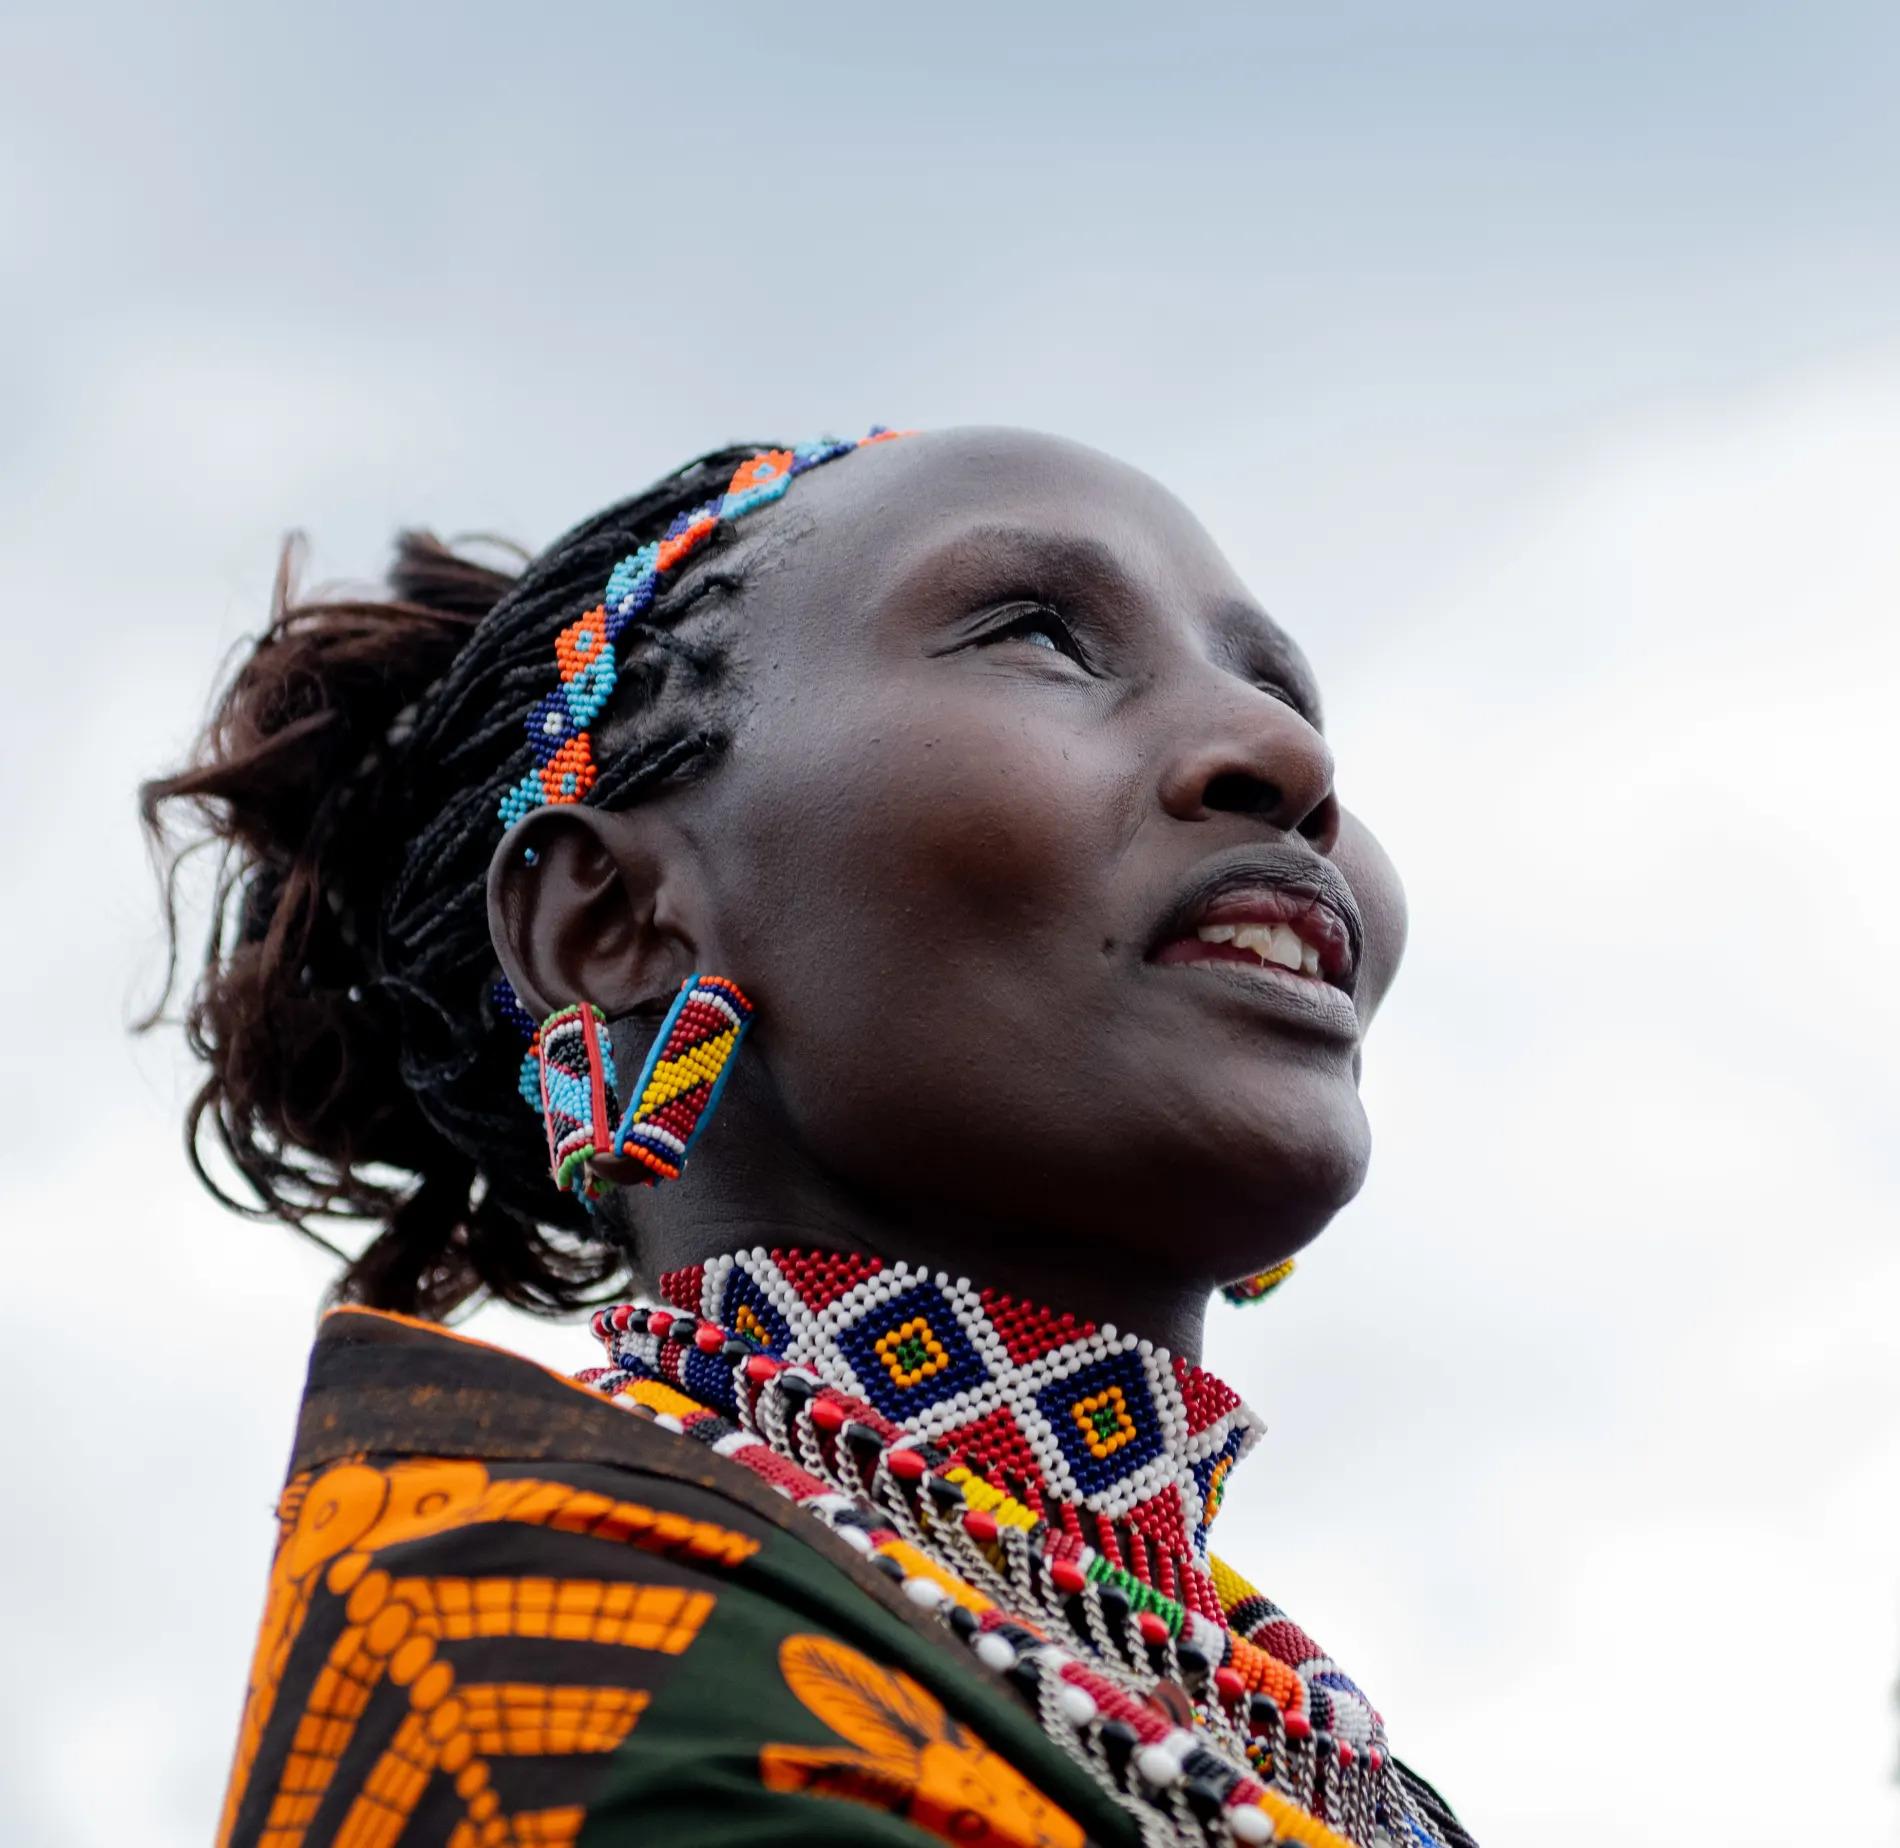 Maasai lady portrait